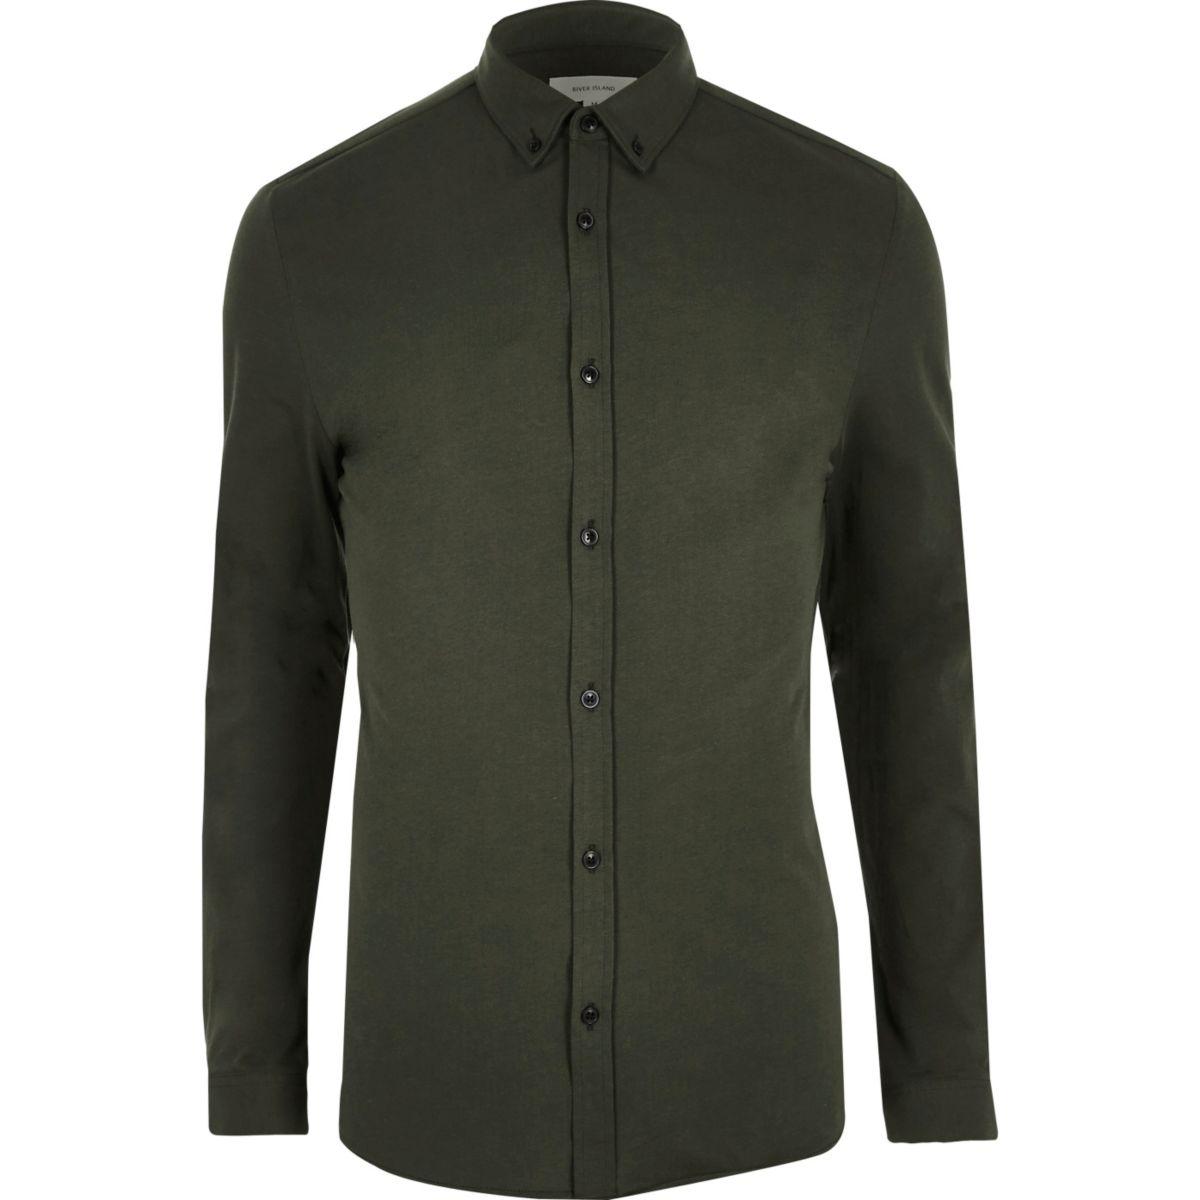 Khaki green muscle fit casual shirt